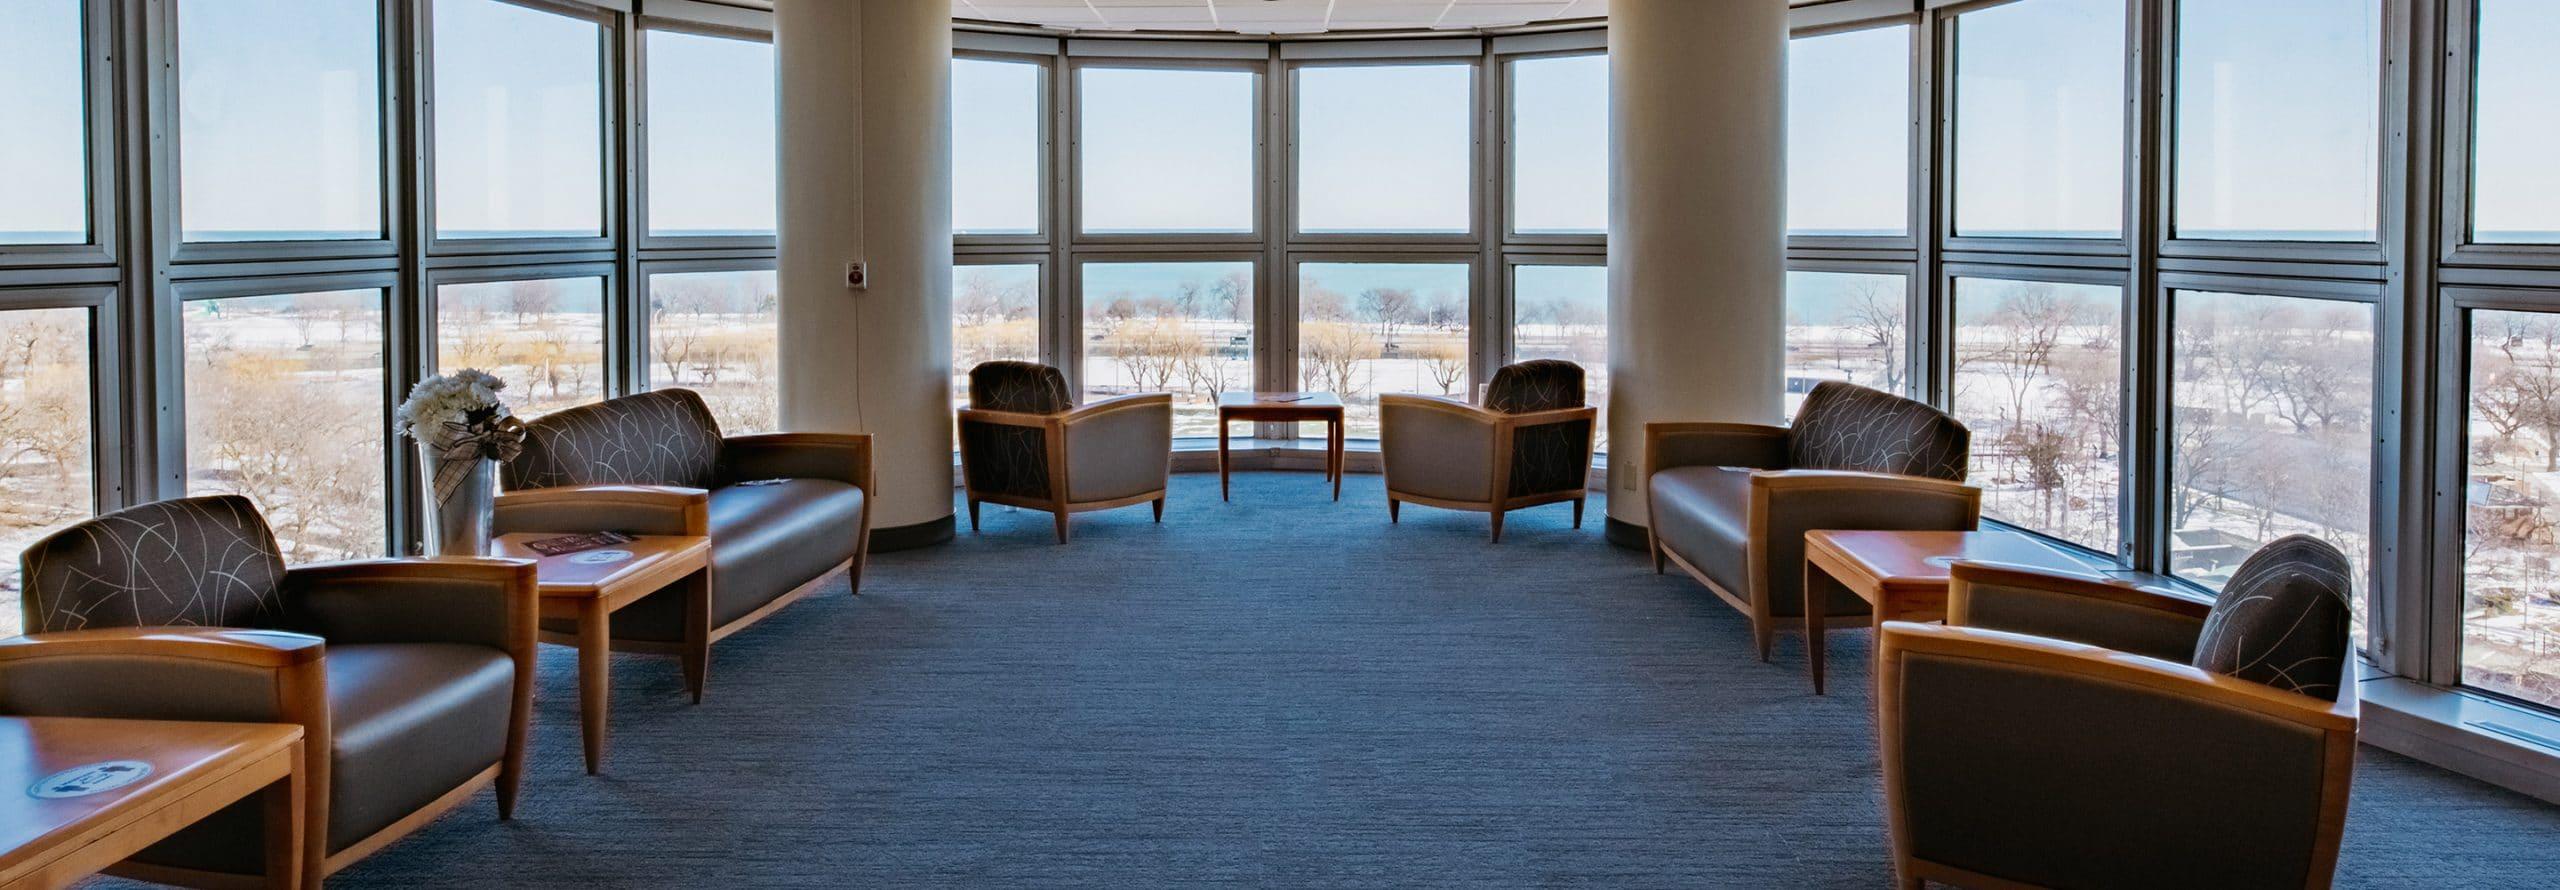 Diamond Headache Inpatient Unit lobby Chicago